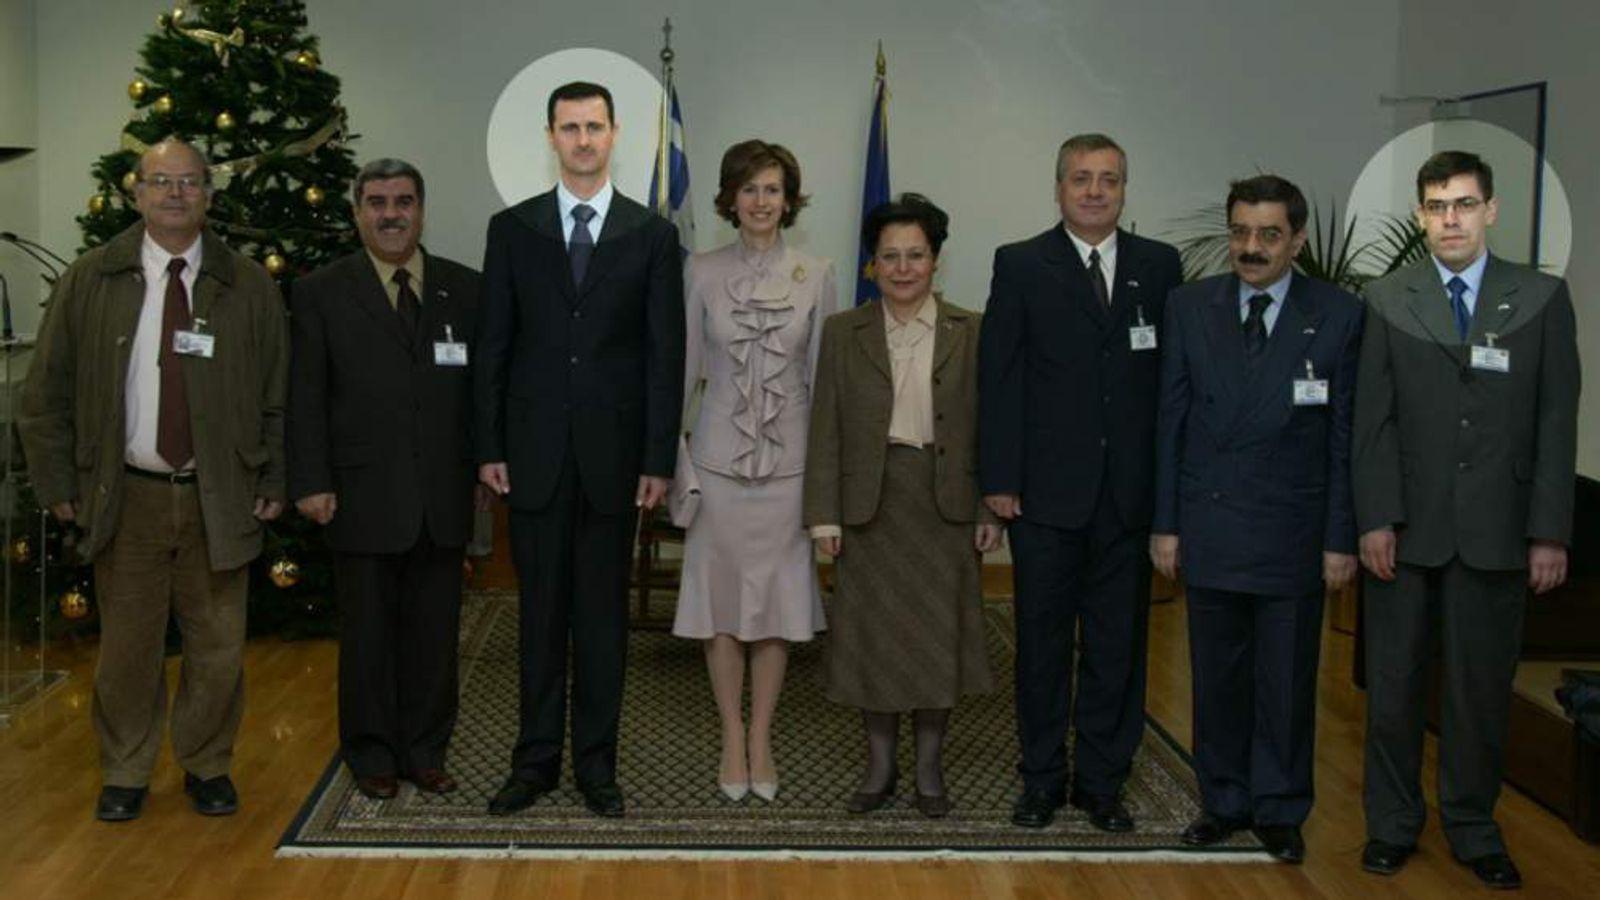 Khaled al Ayoubi (R) and Bashar Assad (3rd left)